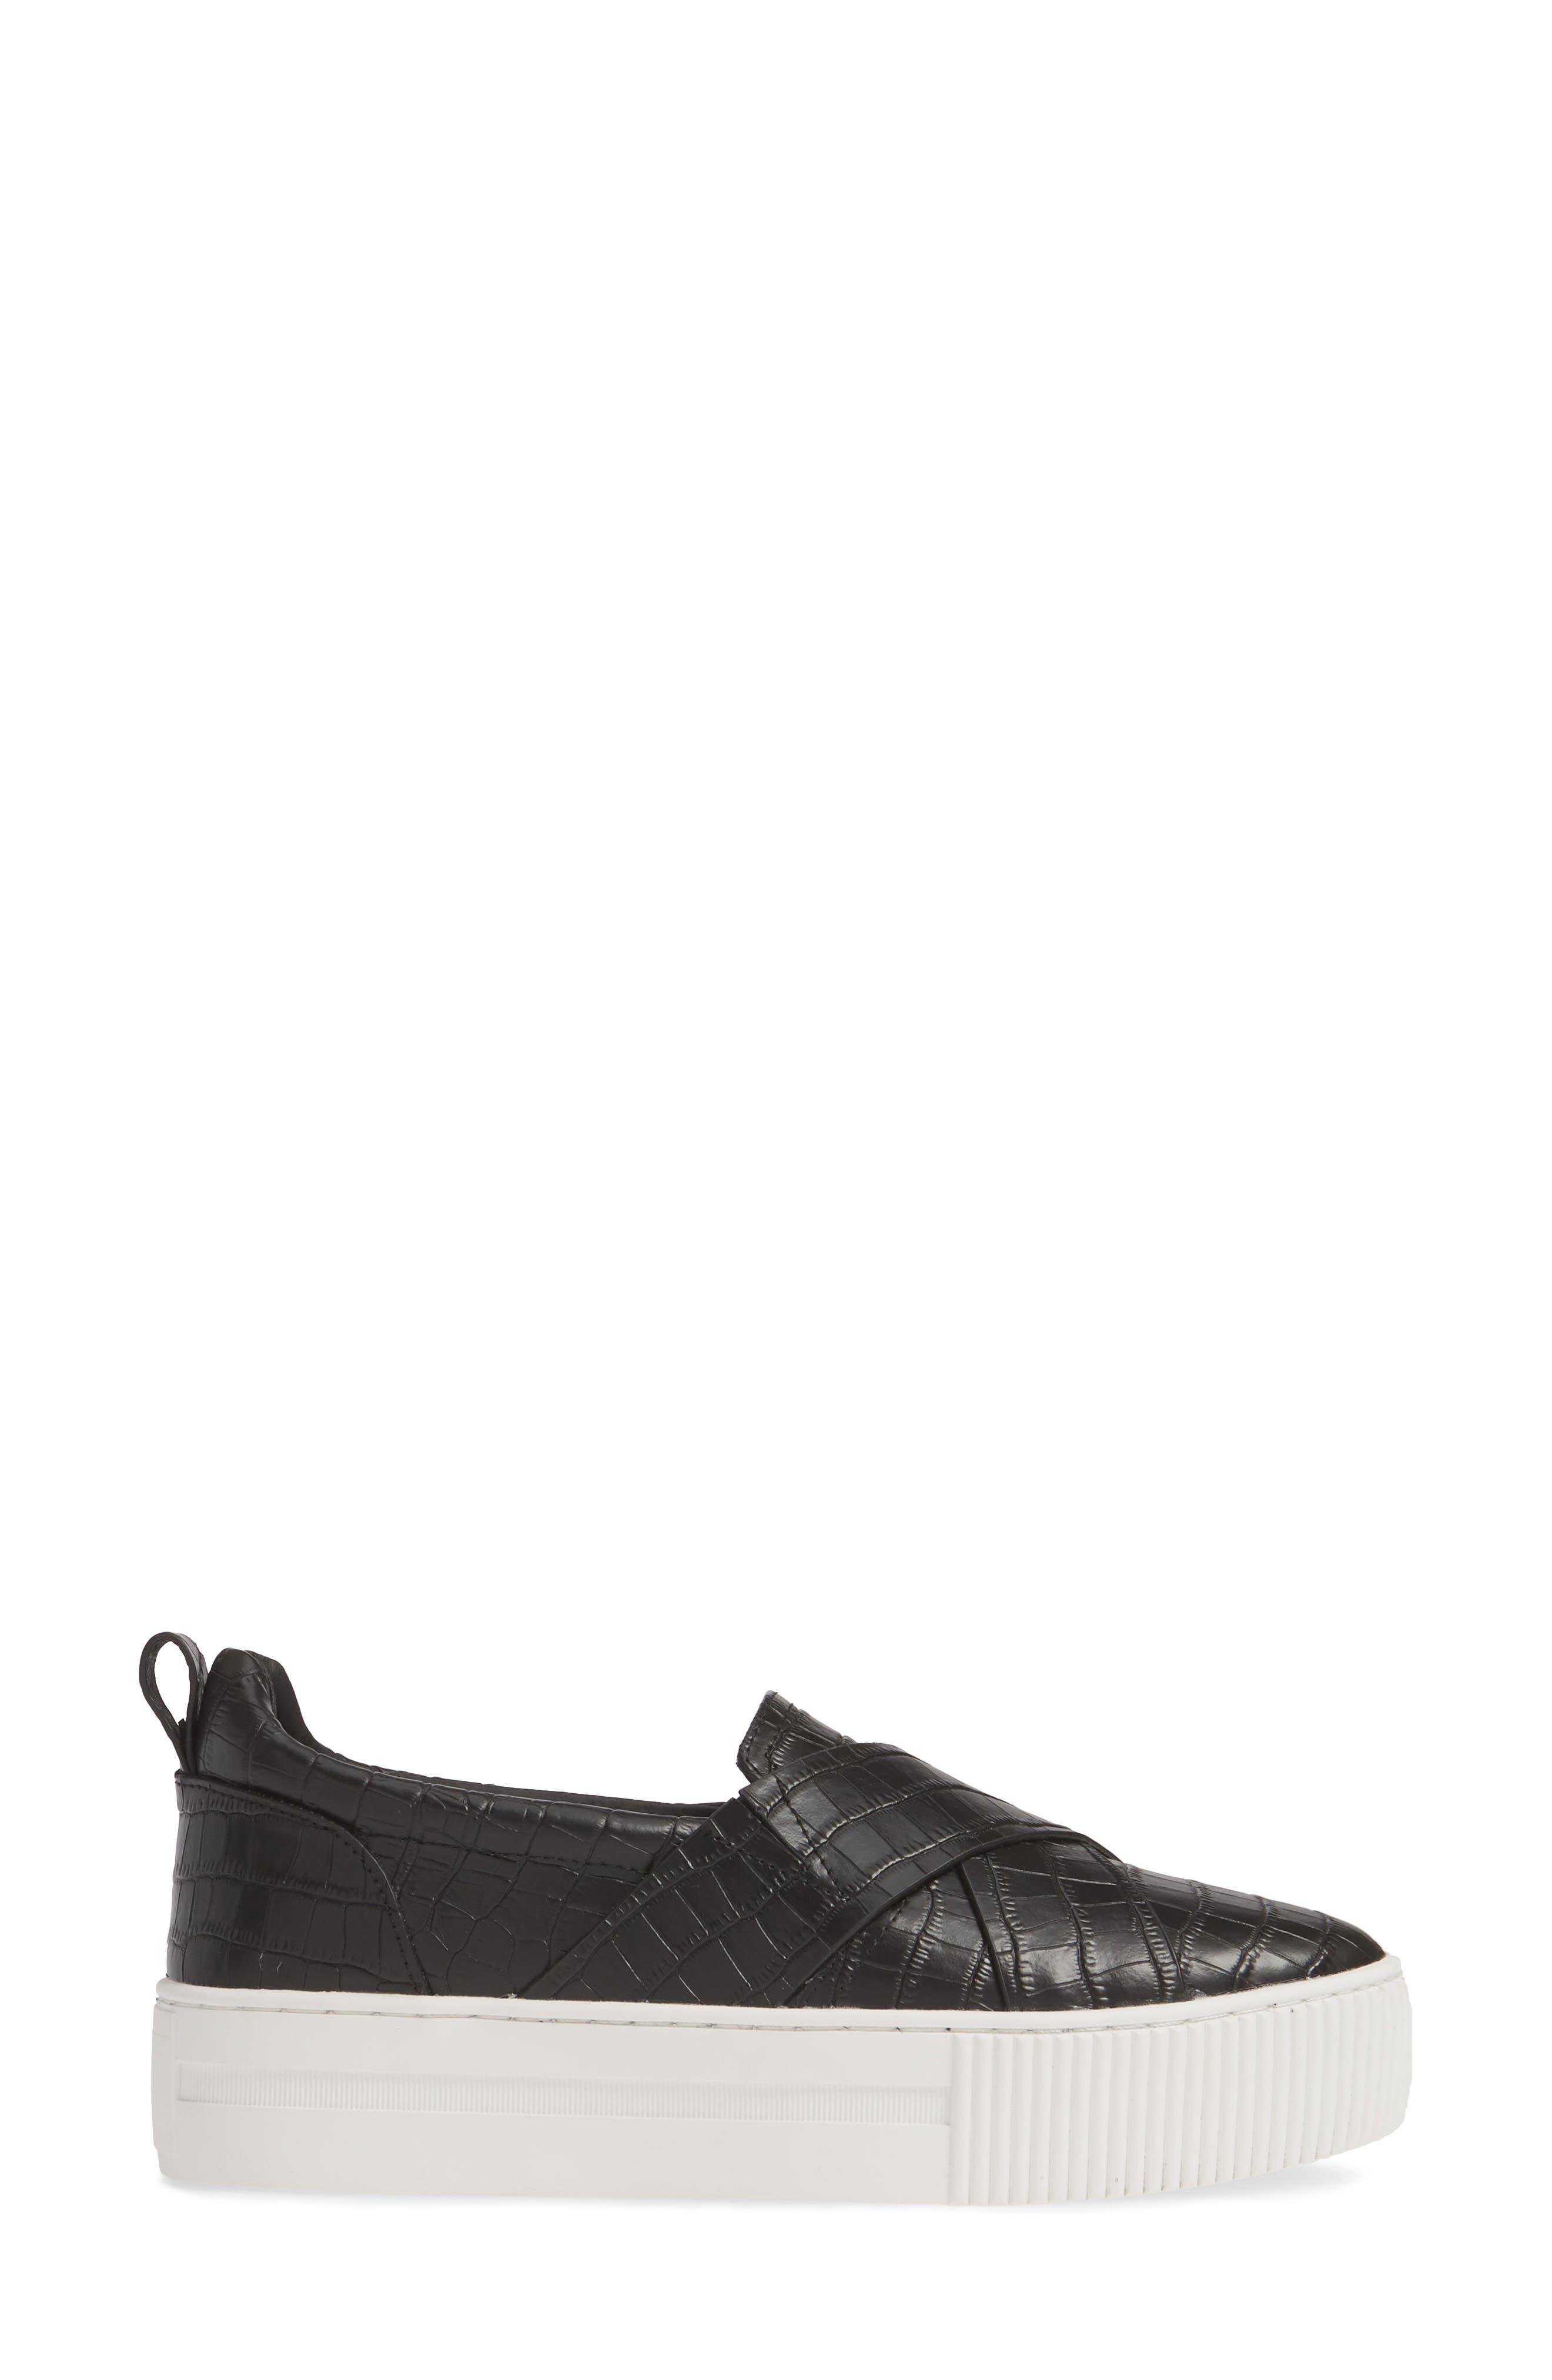 HALOGEN<SUP>®</SUP>, Blakely Slip-On Platform Sneaker, Alternate thumbnail 3, color, BLACK CROCO PRINTED LEATHER